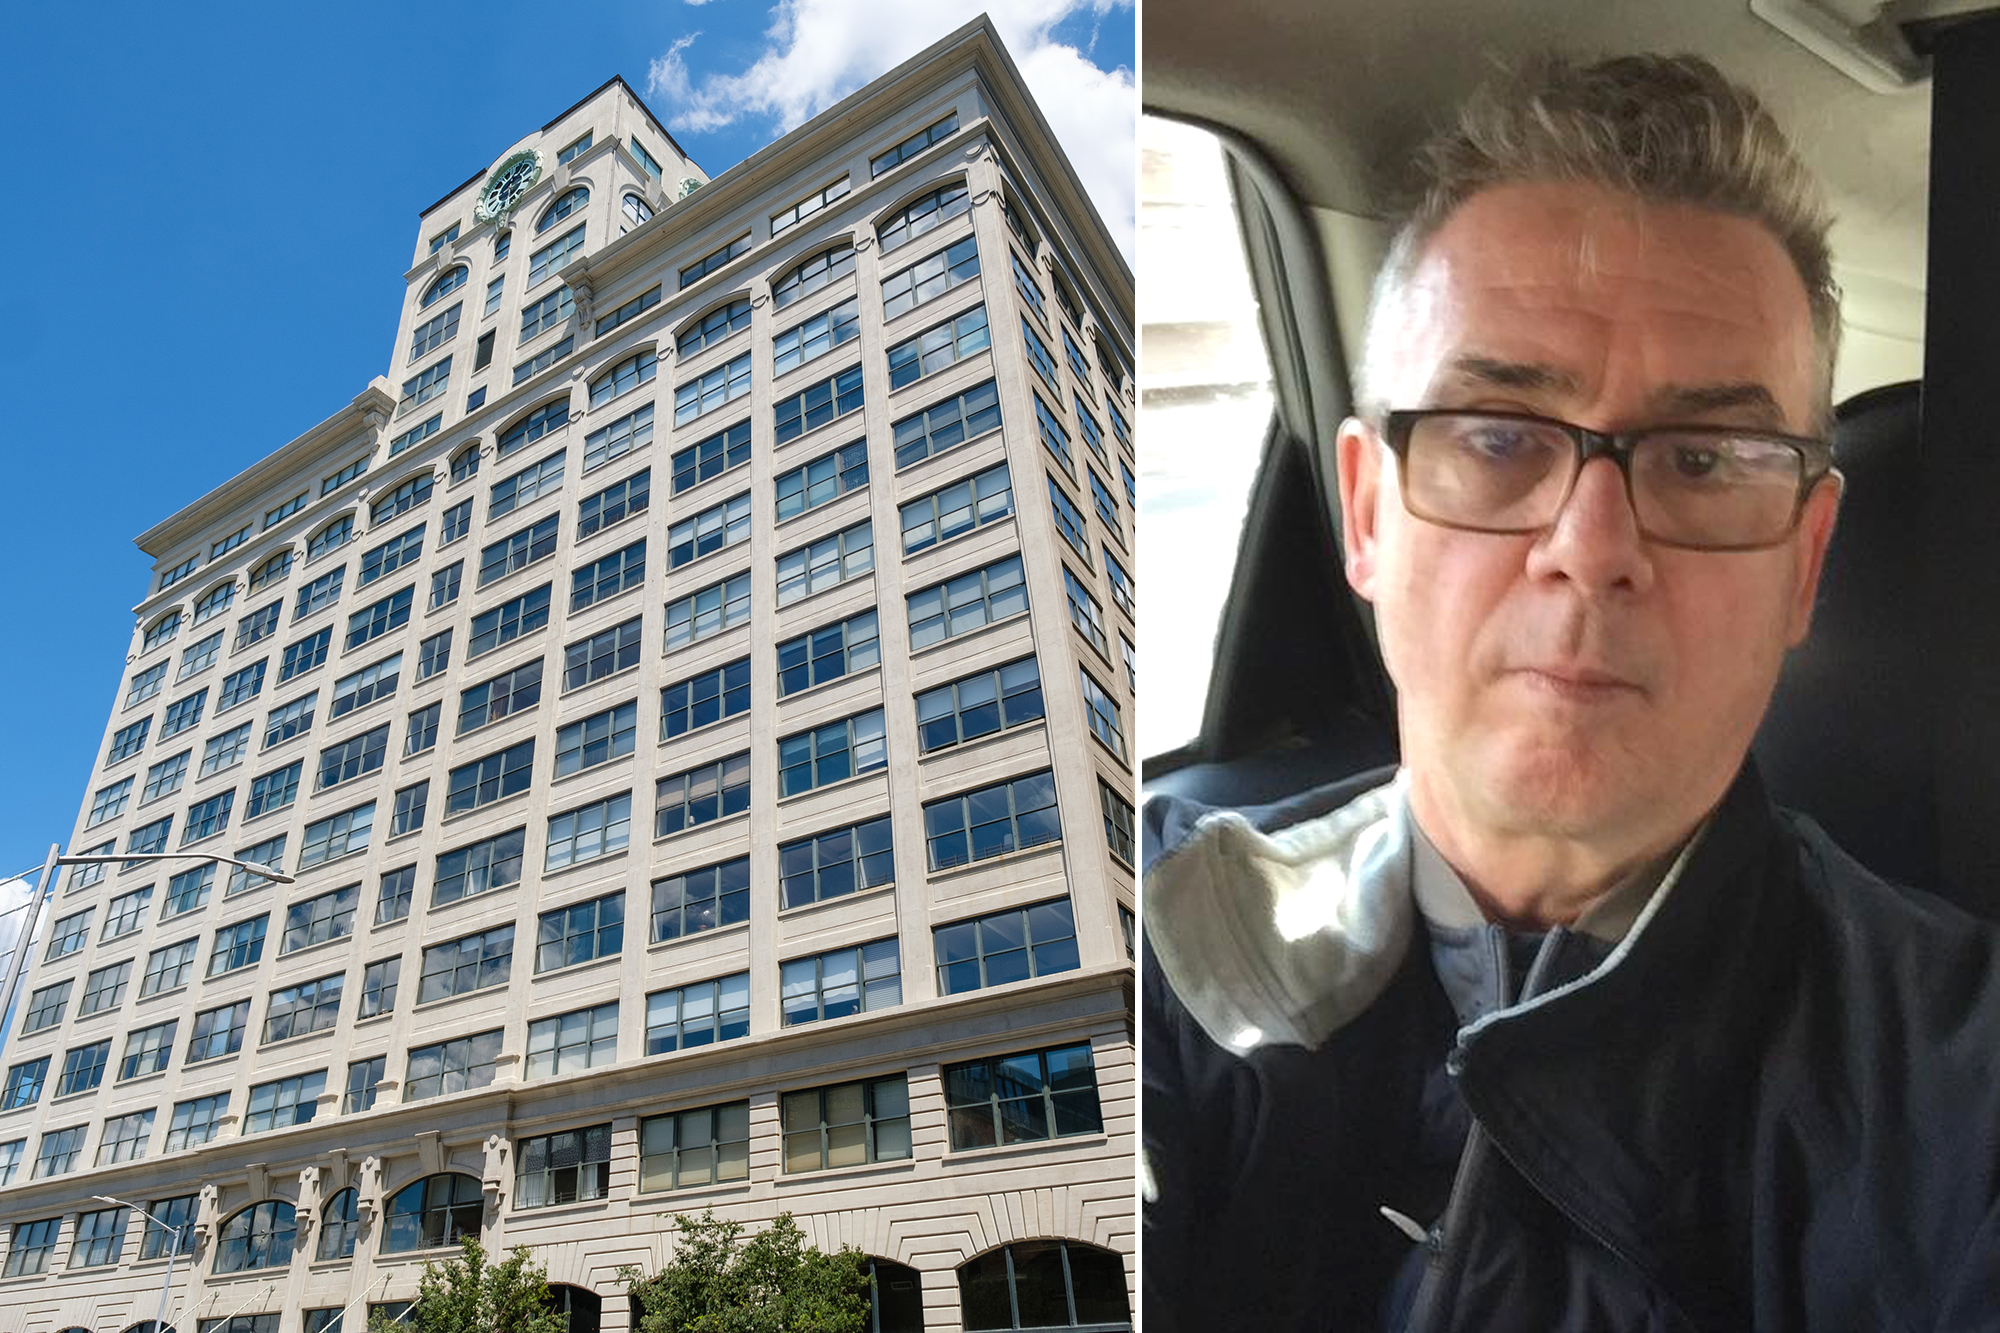 Financier found dead after gay bondage hookup went bad: cops